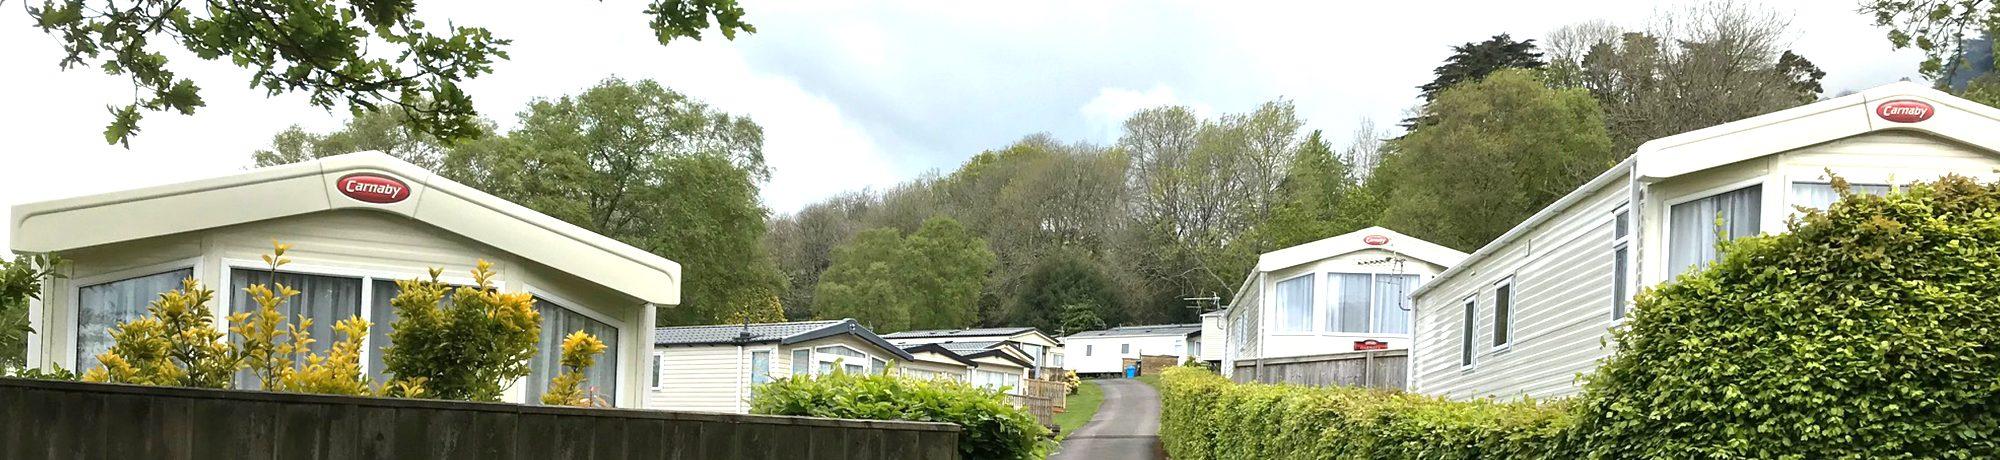 Timber Vale, Slider Image, Lyme Regis, Caravan Park, Campsite, Dorset, Jurassic Coast, Dorset Campsite 21